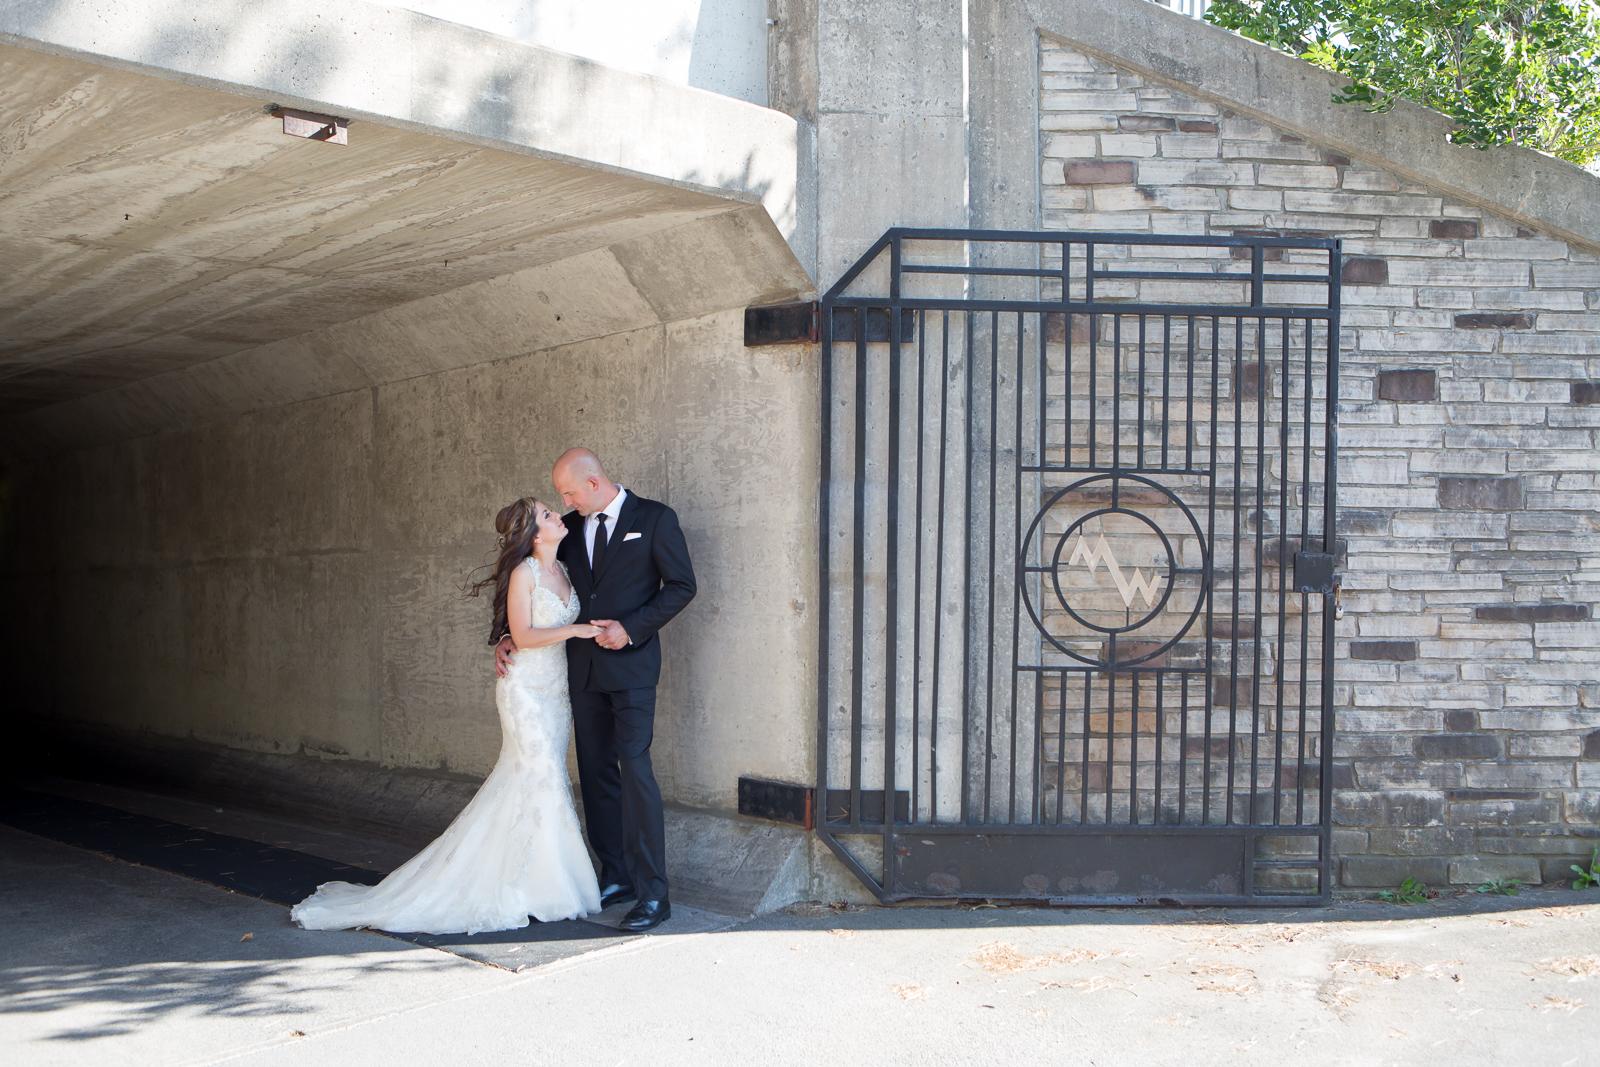 Mark+Avin-BrideGroom-Allison Clark Photo